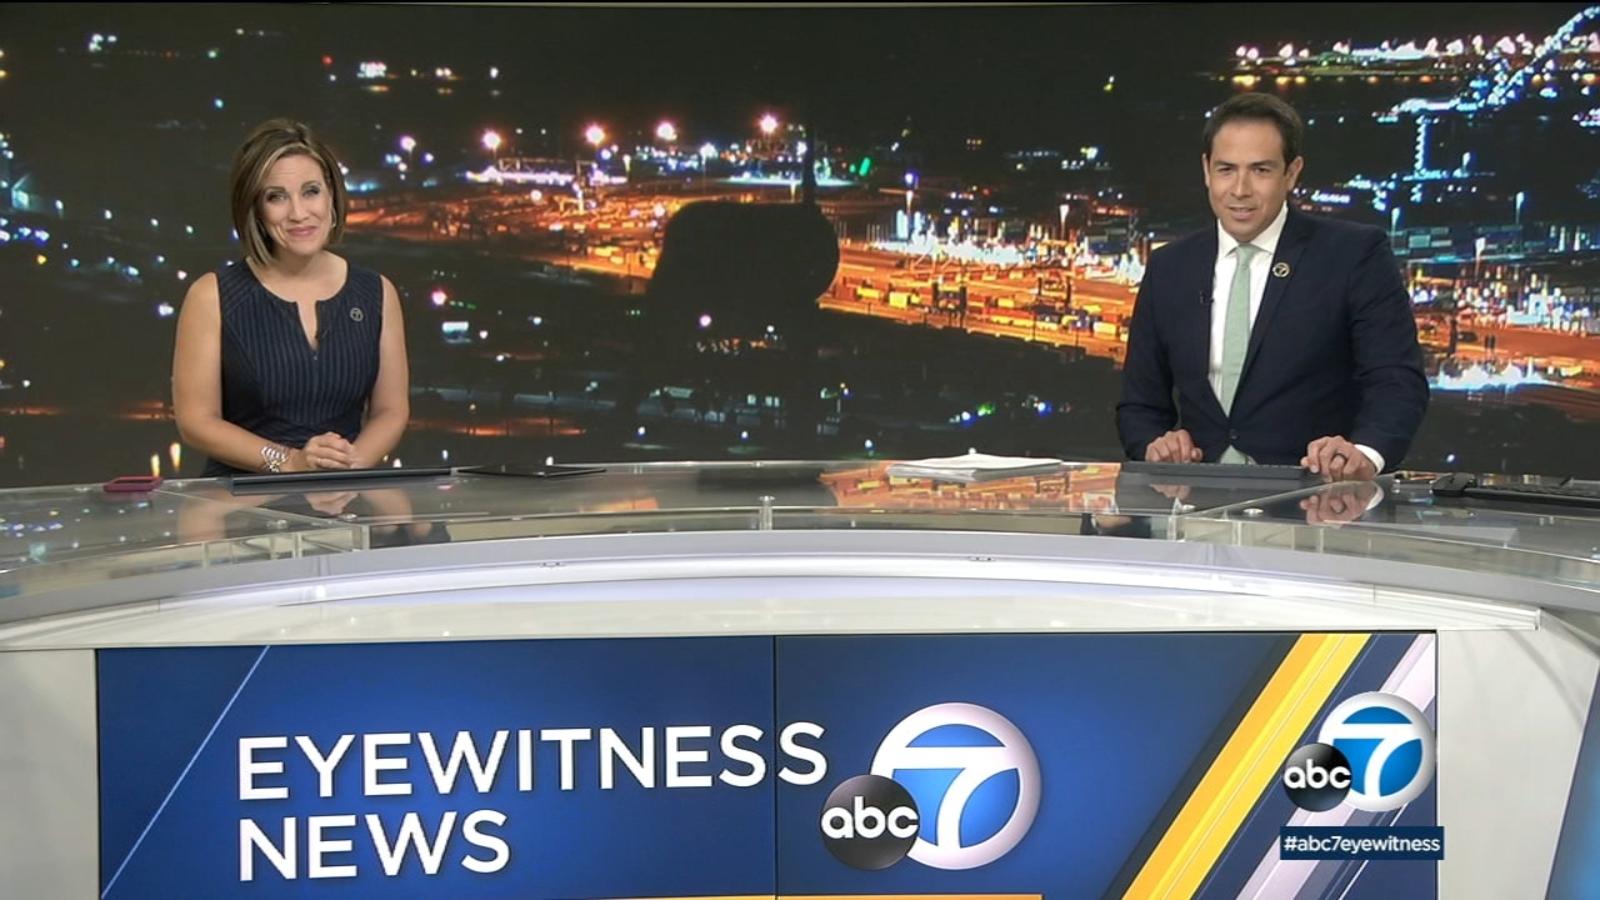 Eyewitness News at 6am - ABC7 Los Angeles